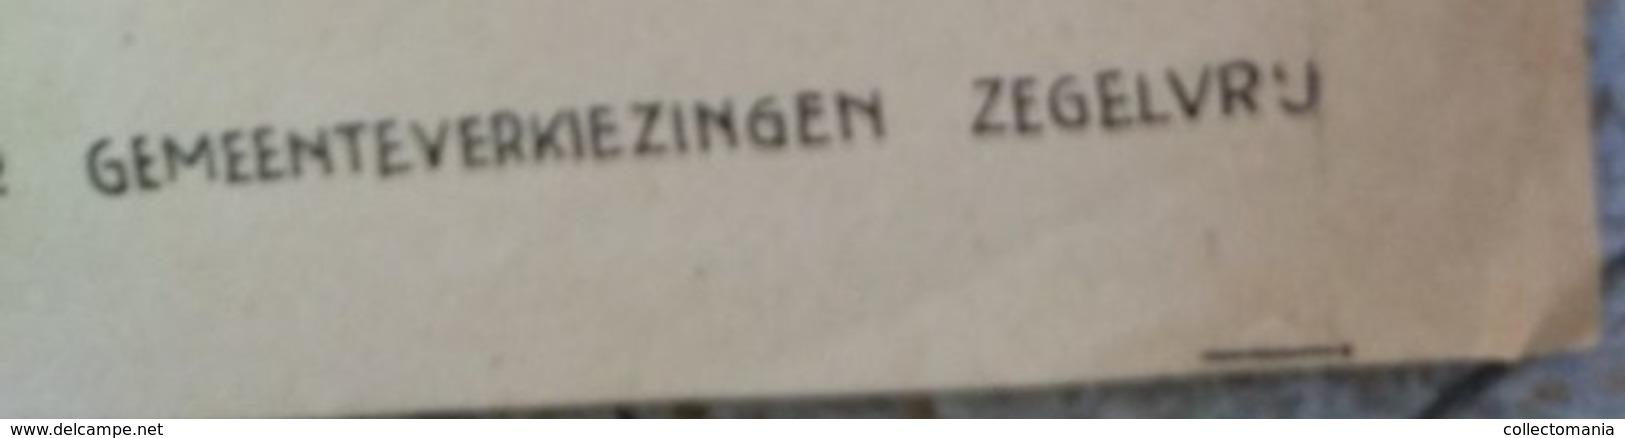 één Affiche 70X50cm - Anno 1946 C.V.P. Gemeente Antwerpen Verkiezingen Slogan  FAIR PLAY  Huysmans - Van Marc Sleen - Collectors